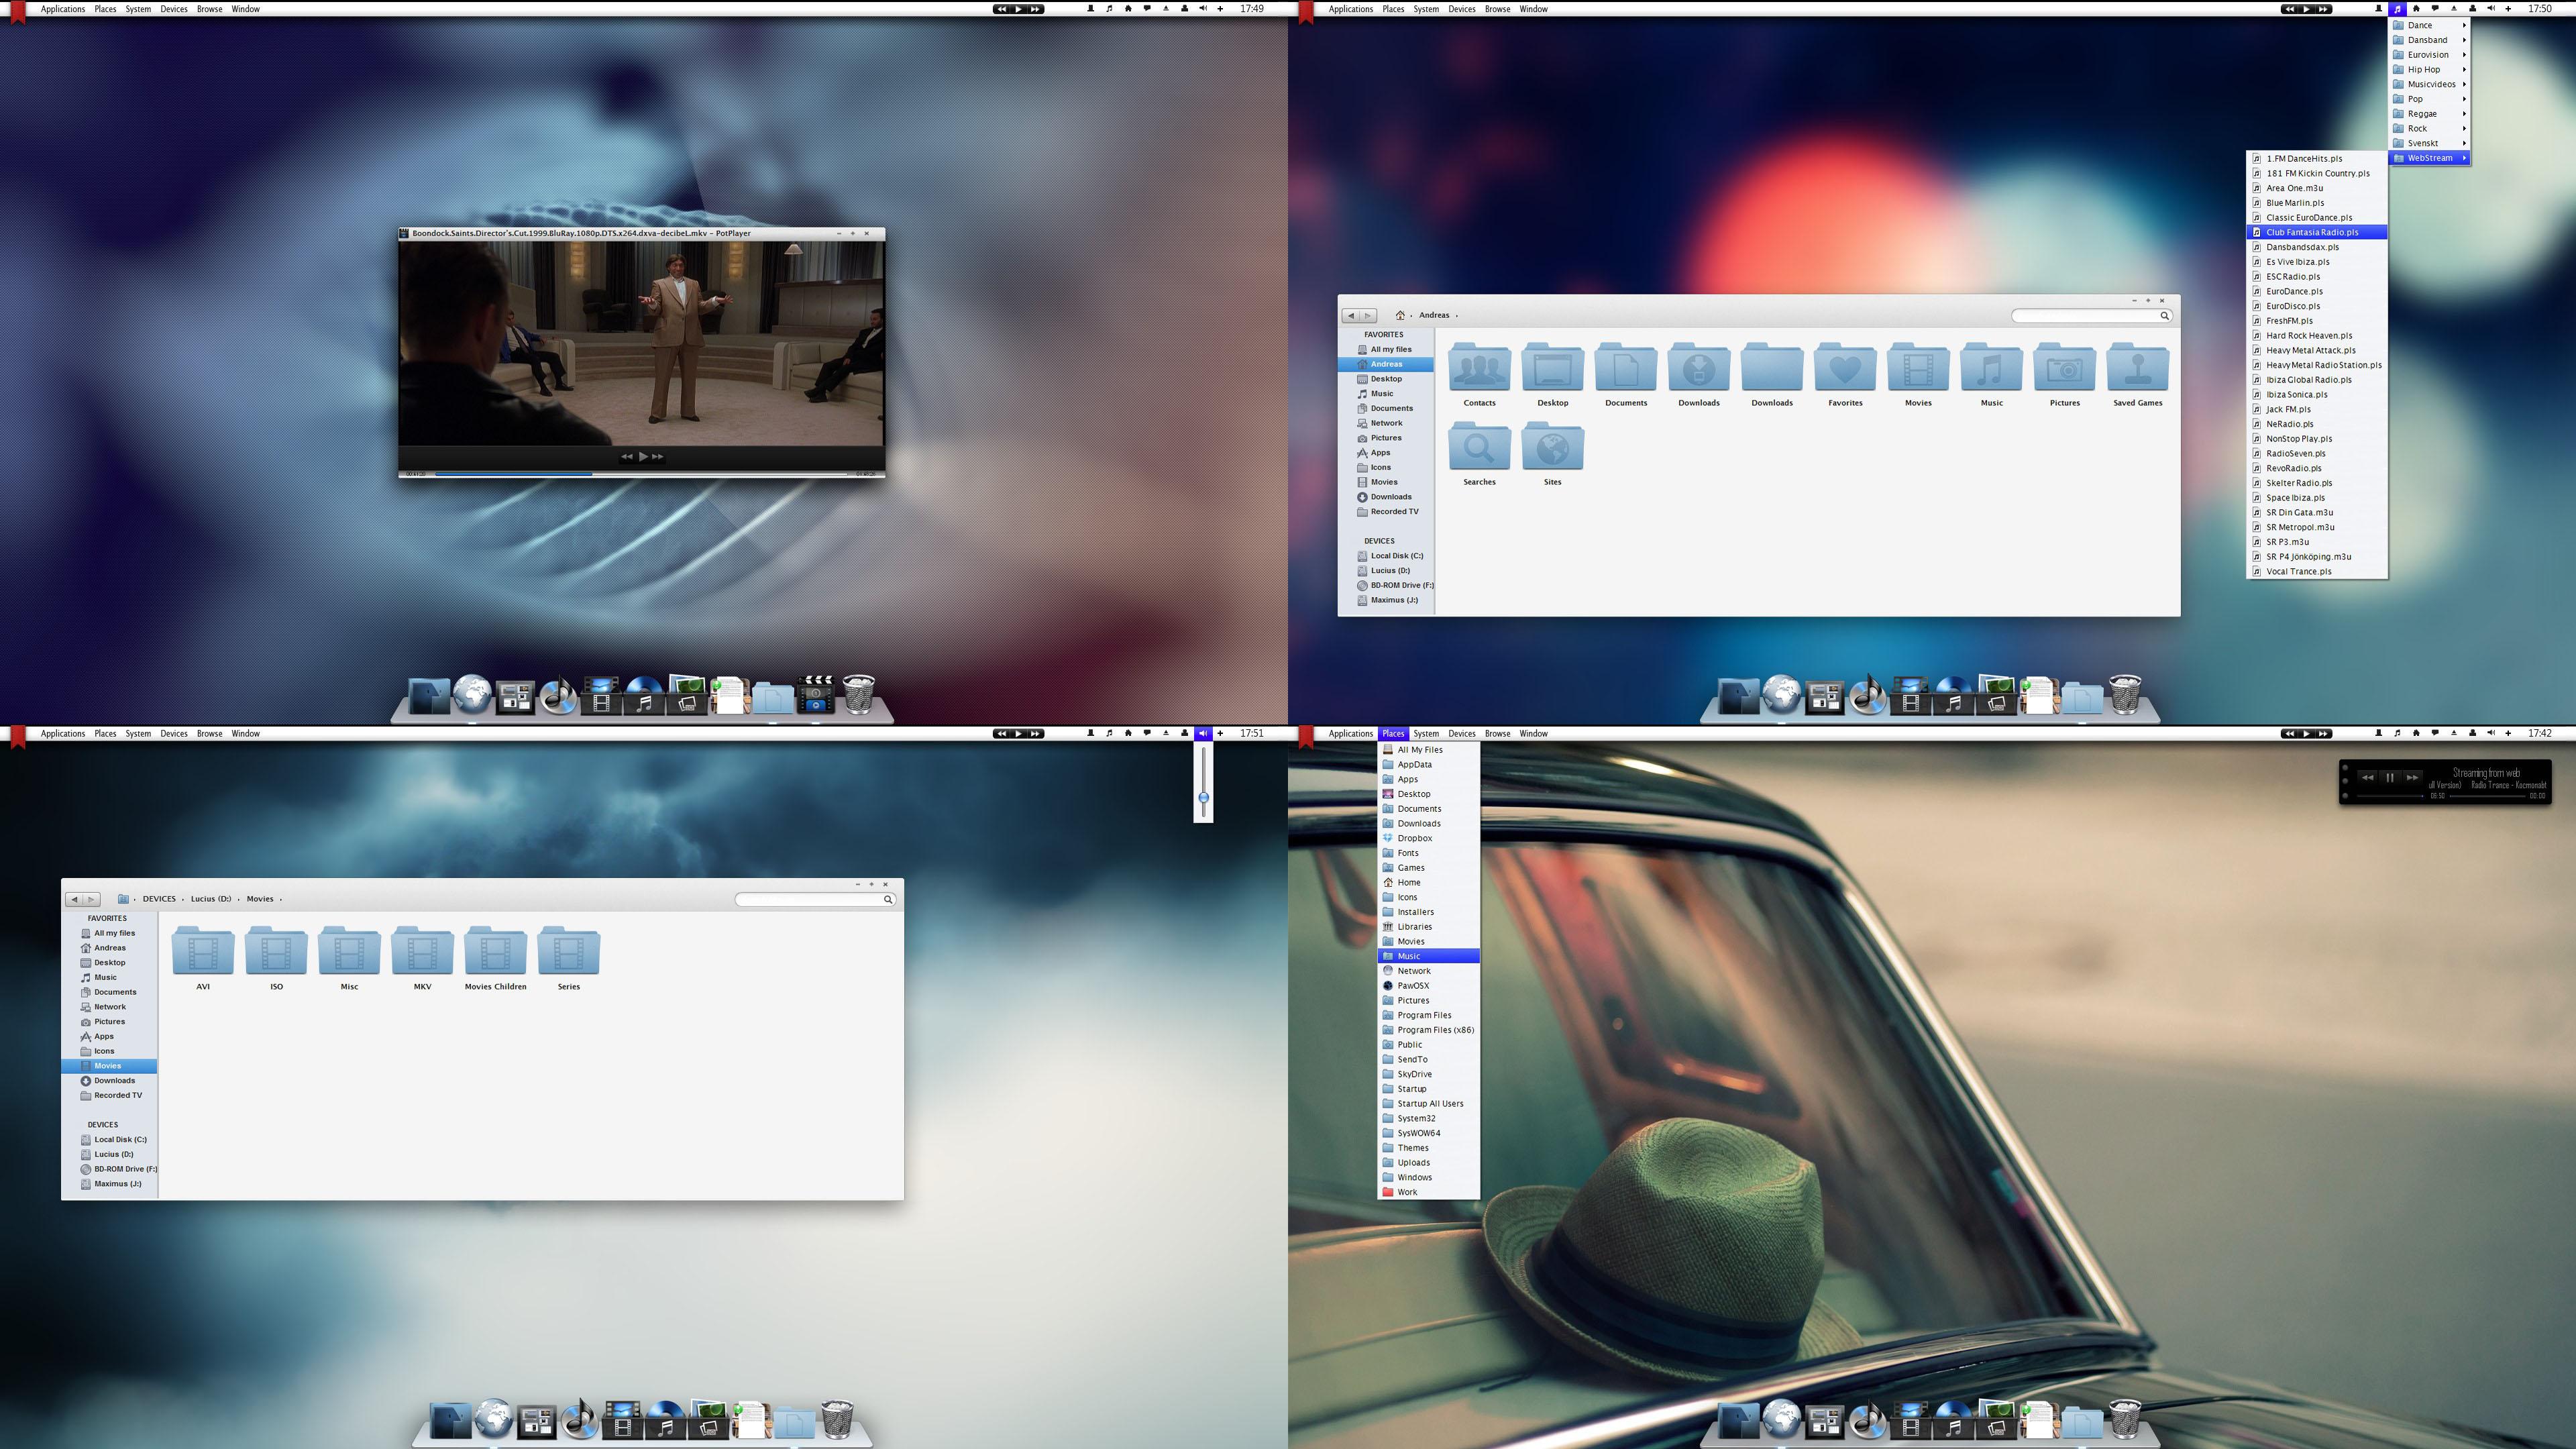 Screenshot 2012-12-11 by Mr-Ragnarok